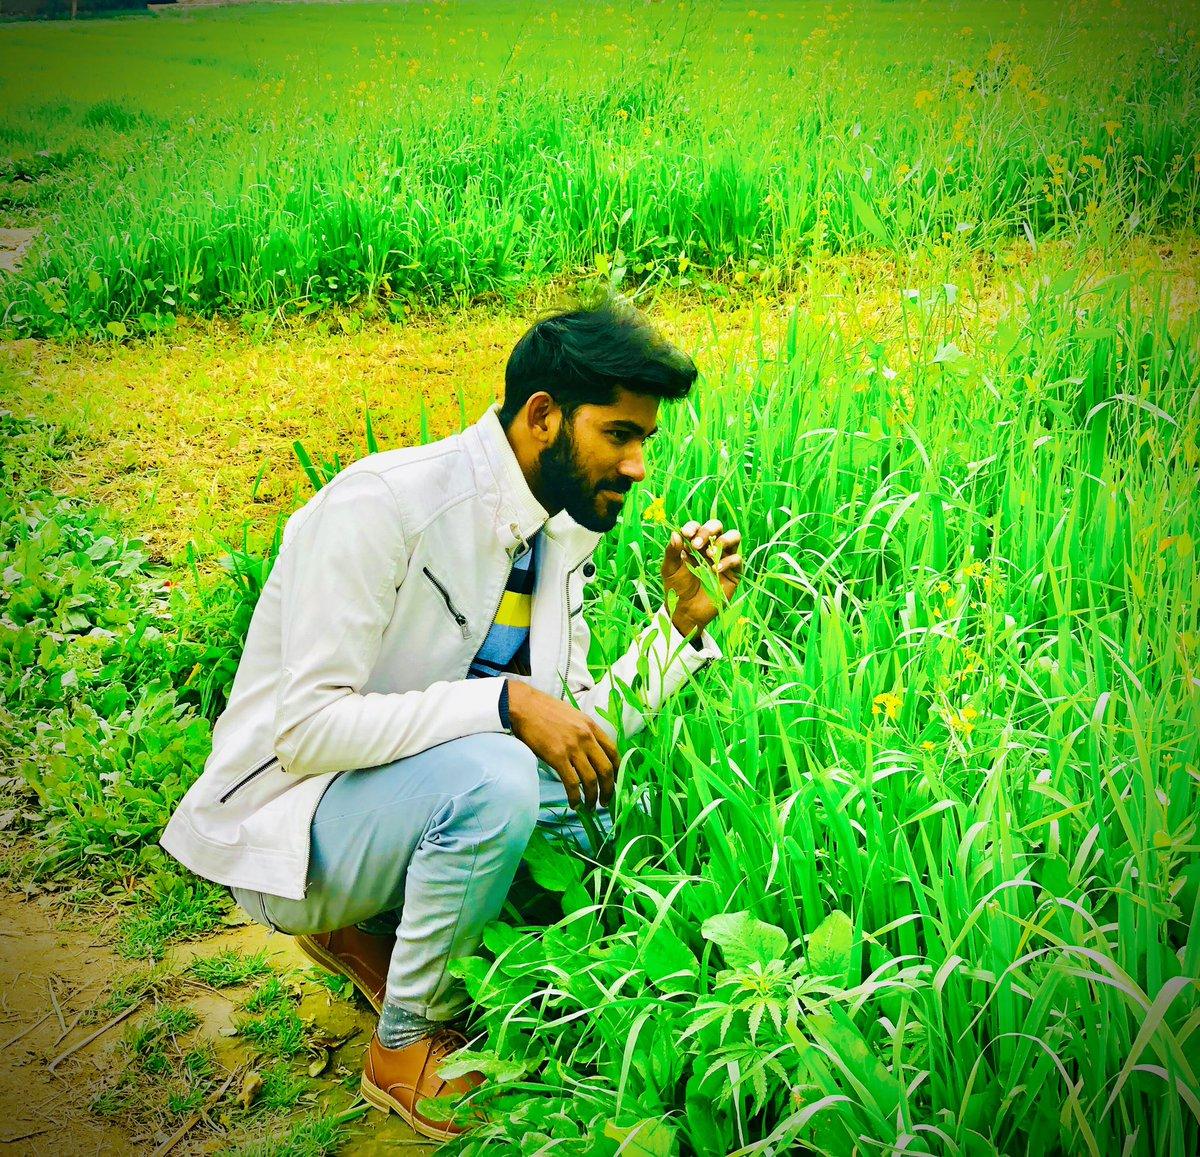 Nature . . .  #likes #like #follow #likeforlikes #love #instagood #instagram #followforfollowback #followme #photooftheday #bhfyp #instalike #photography #l #instadaily #me #picoftheday #beautiful #myself #likeforfollow #fashion #smile #followers #johnajk #johnchristajk